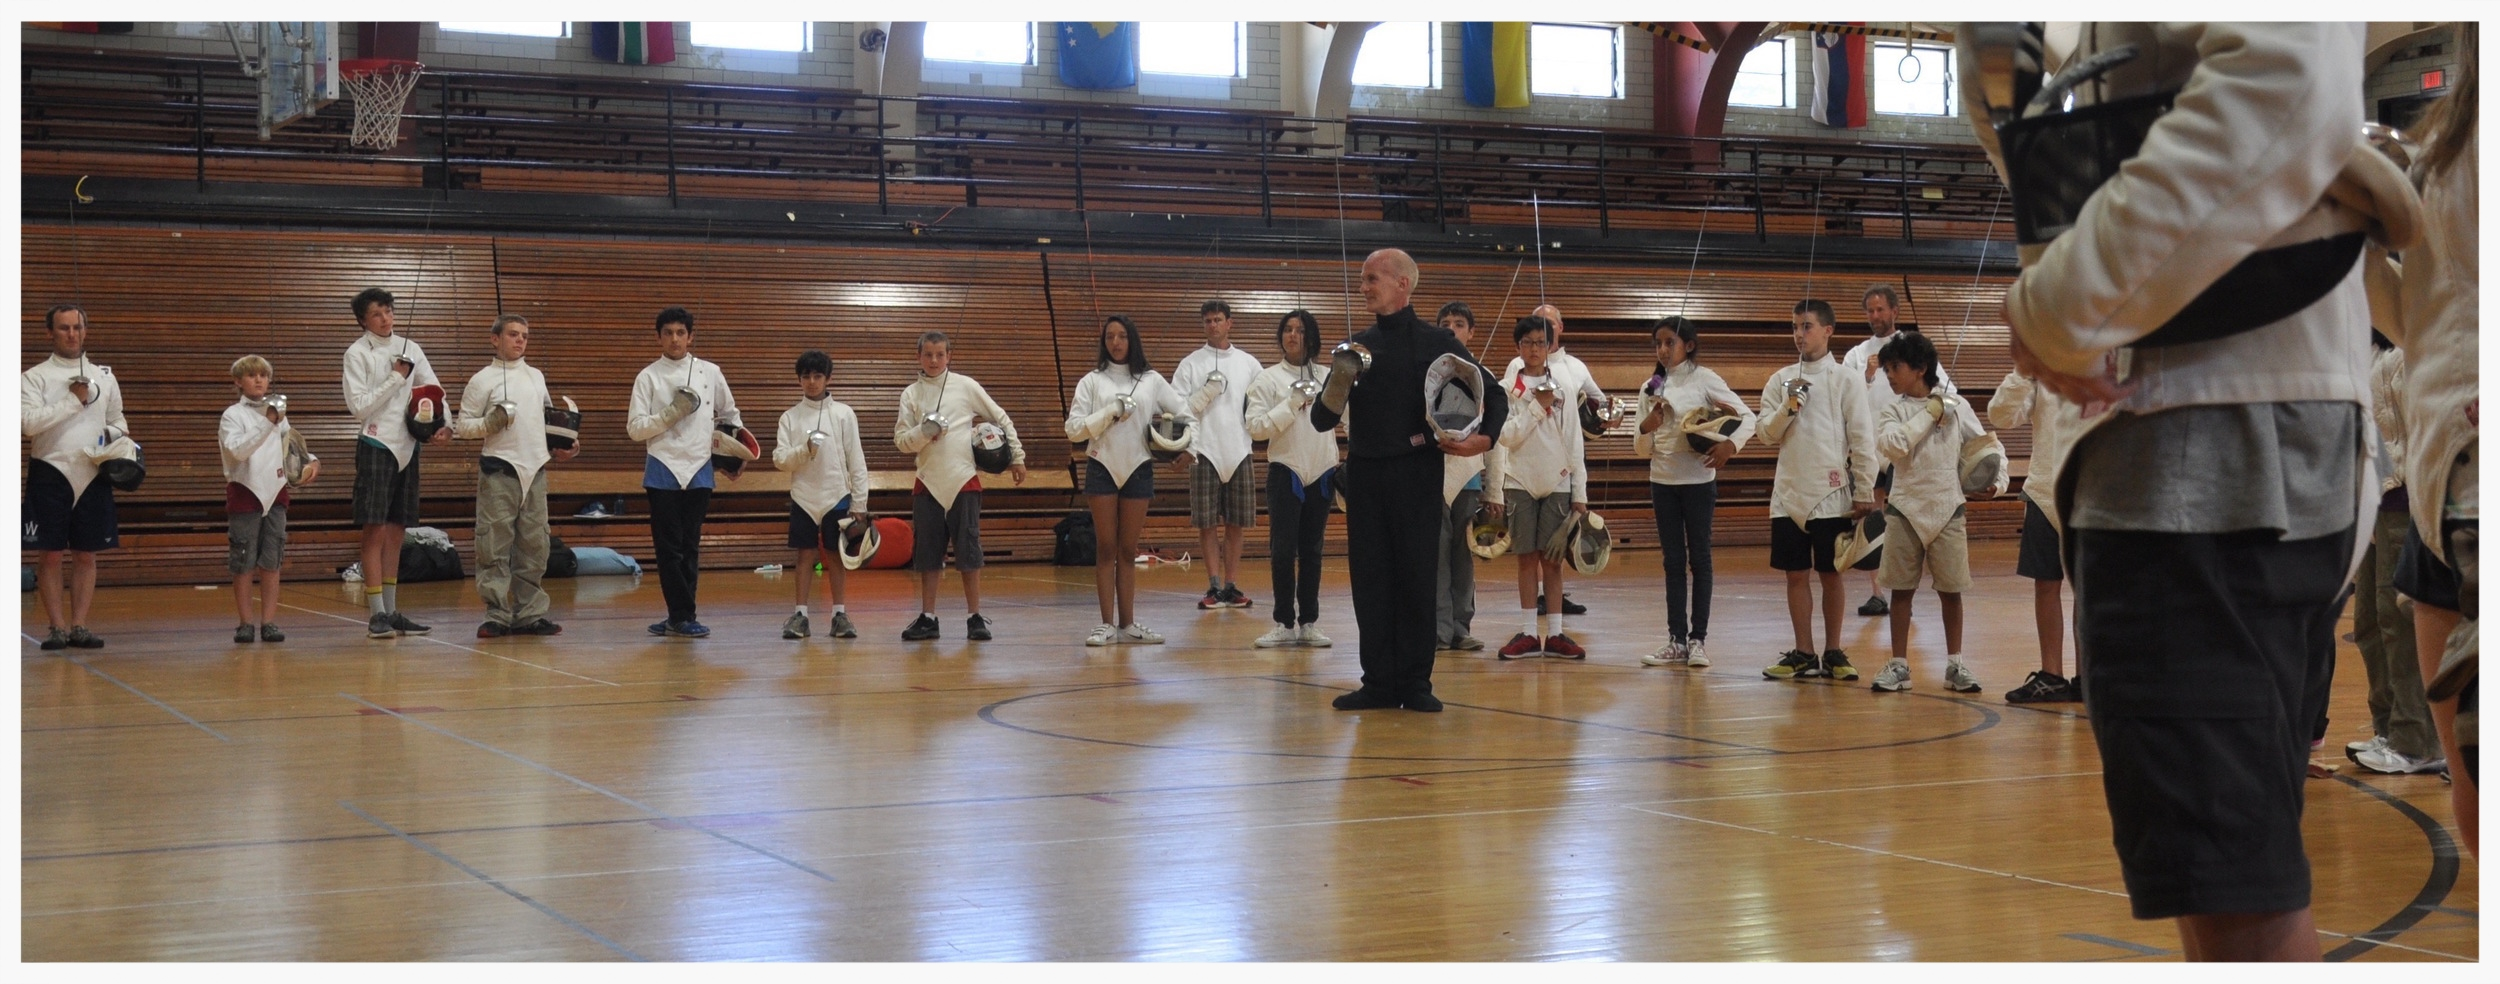 SPA Fencers Salute.jpg